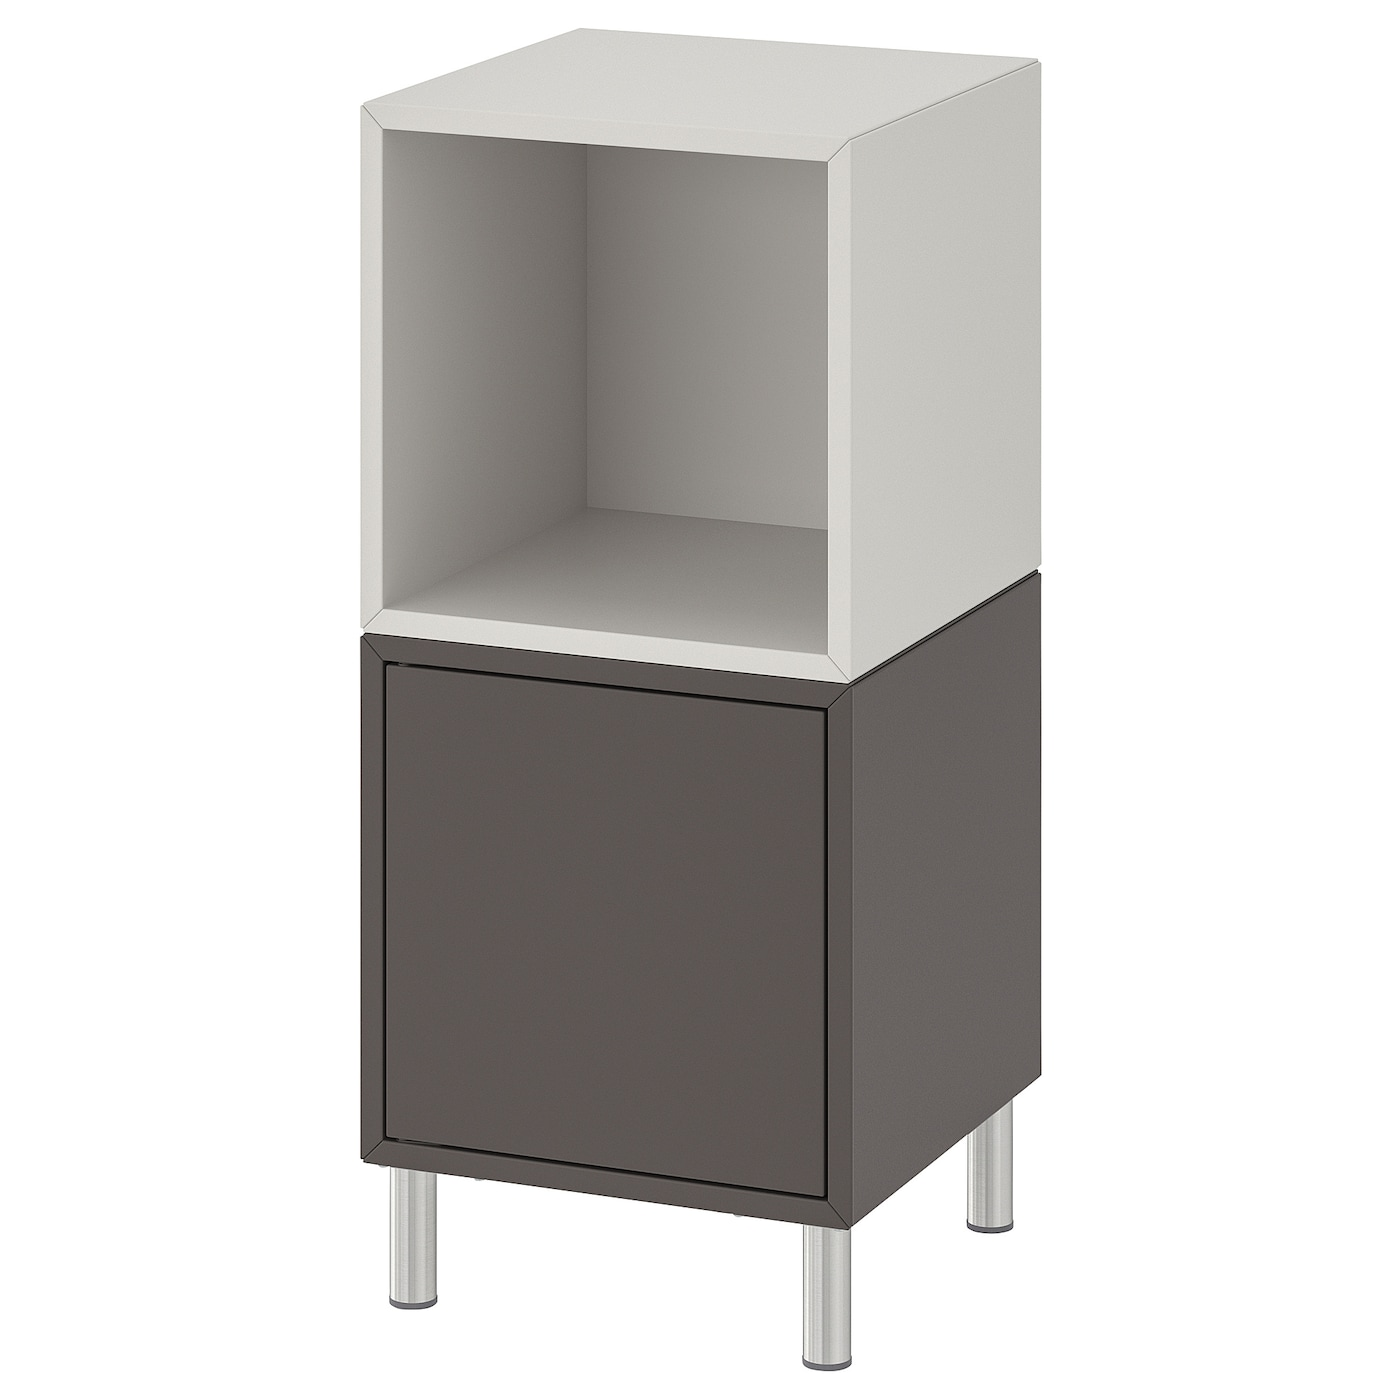 Combinaci�n armario+patas, gris oscuro/gris claro